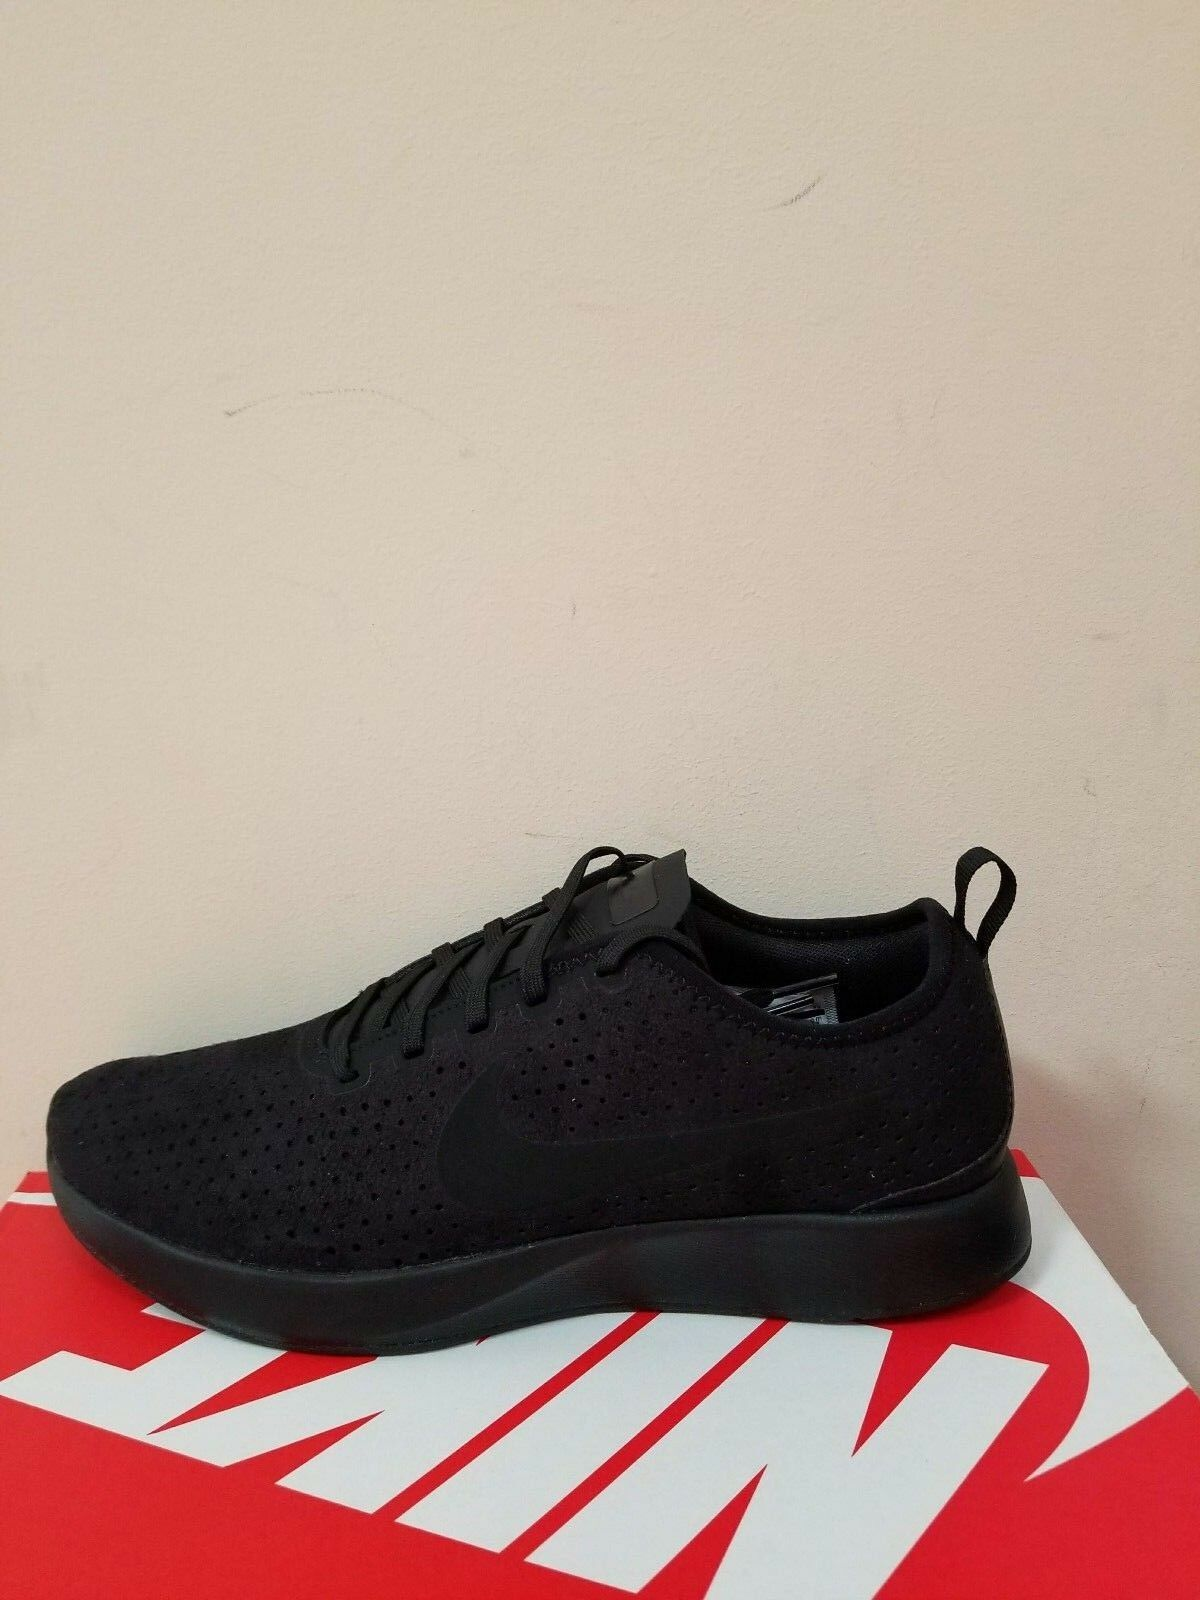 Nike Men's Dualtone Racer shoes Size 13 NIB